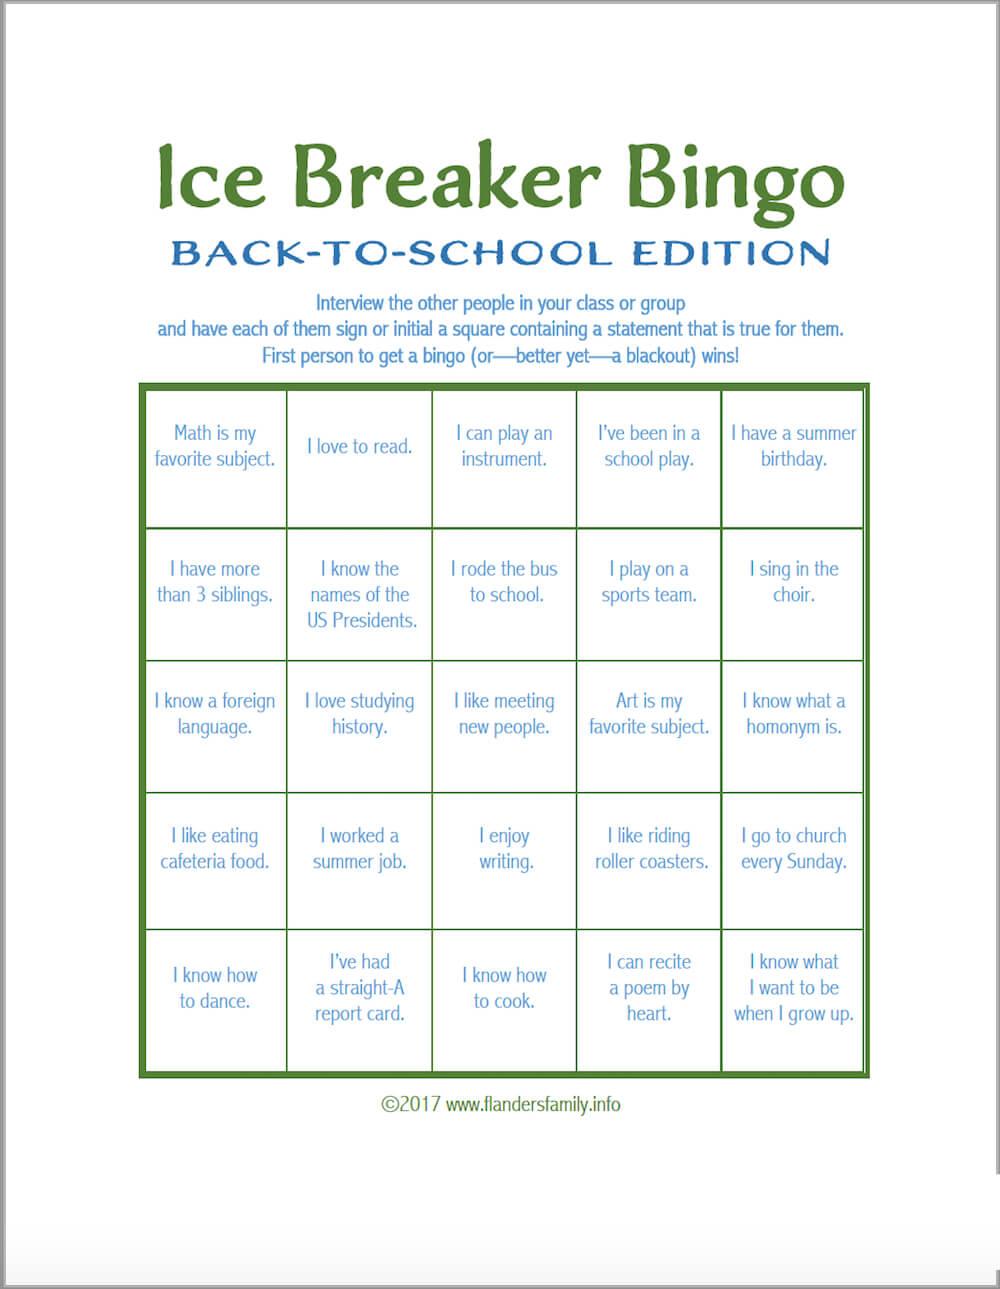 Ice Breaker Bingo: Back To School Version - Flanders Family With Regard To Ice Breaker Bingo Card Template